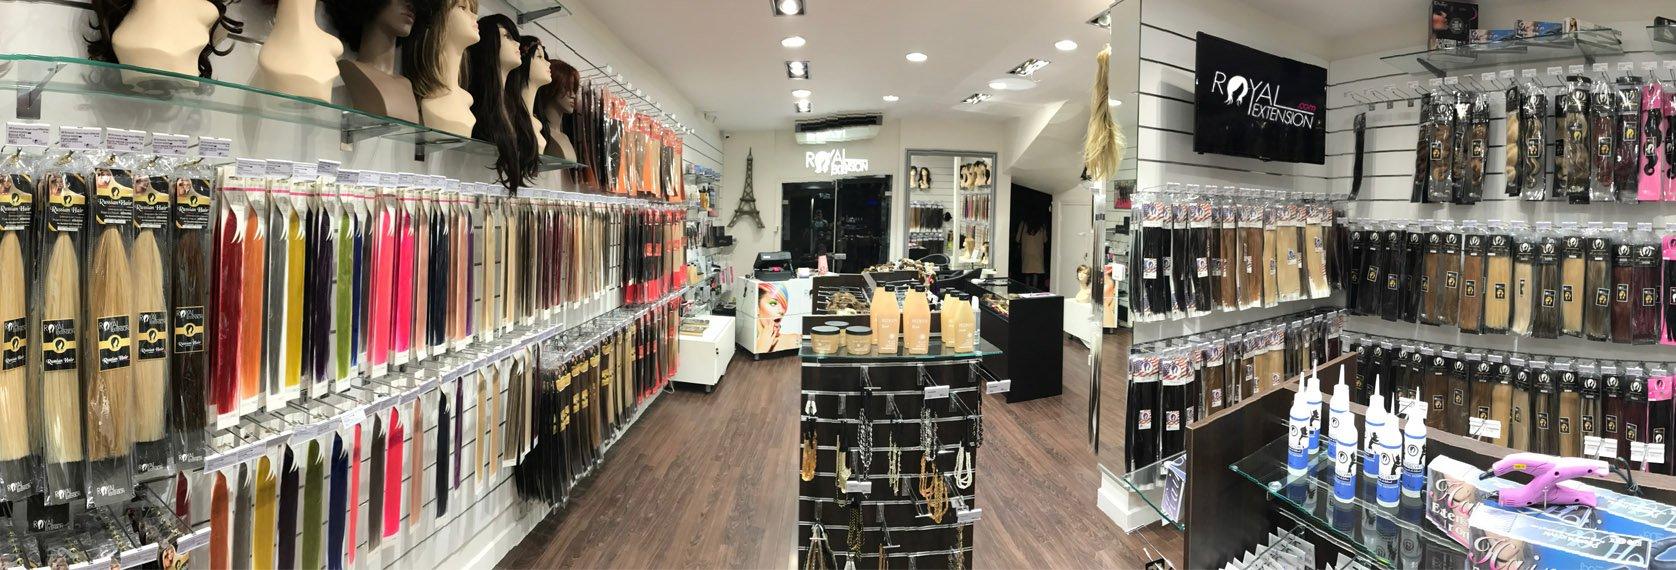 Nos magasins  Royal Extension